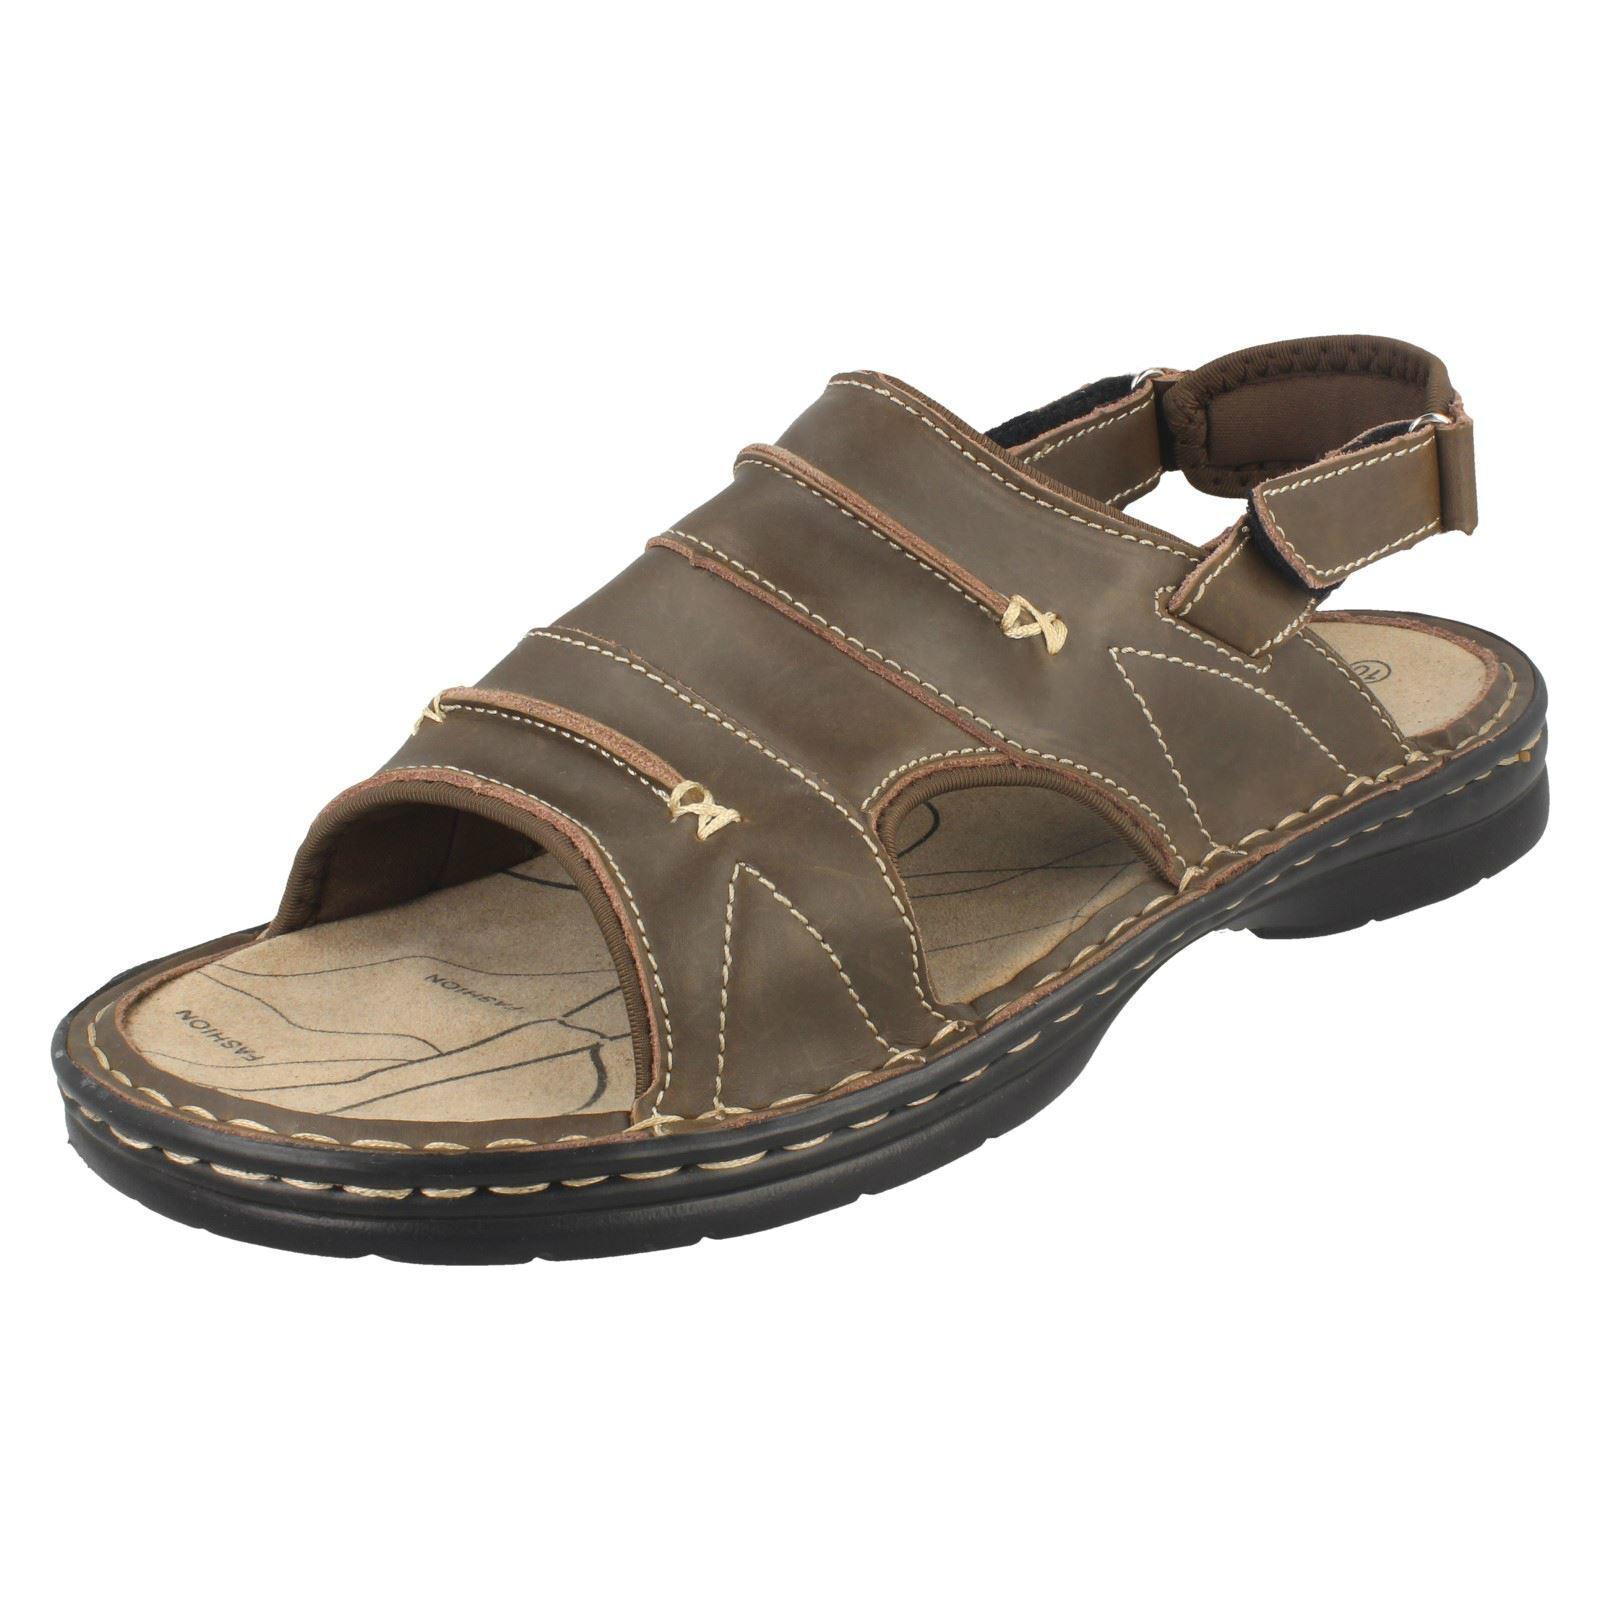 Mens Northwest Territory Sandals 'Savanna'